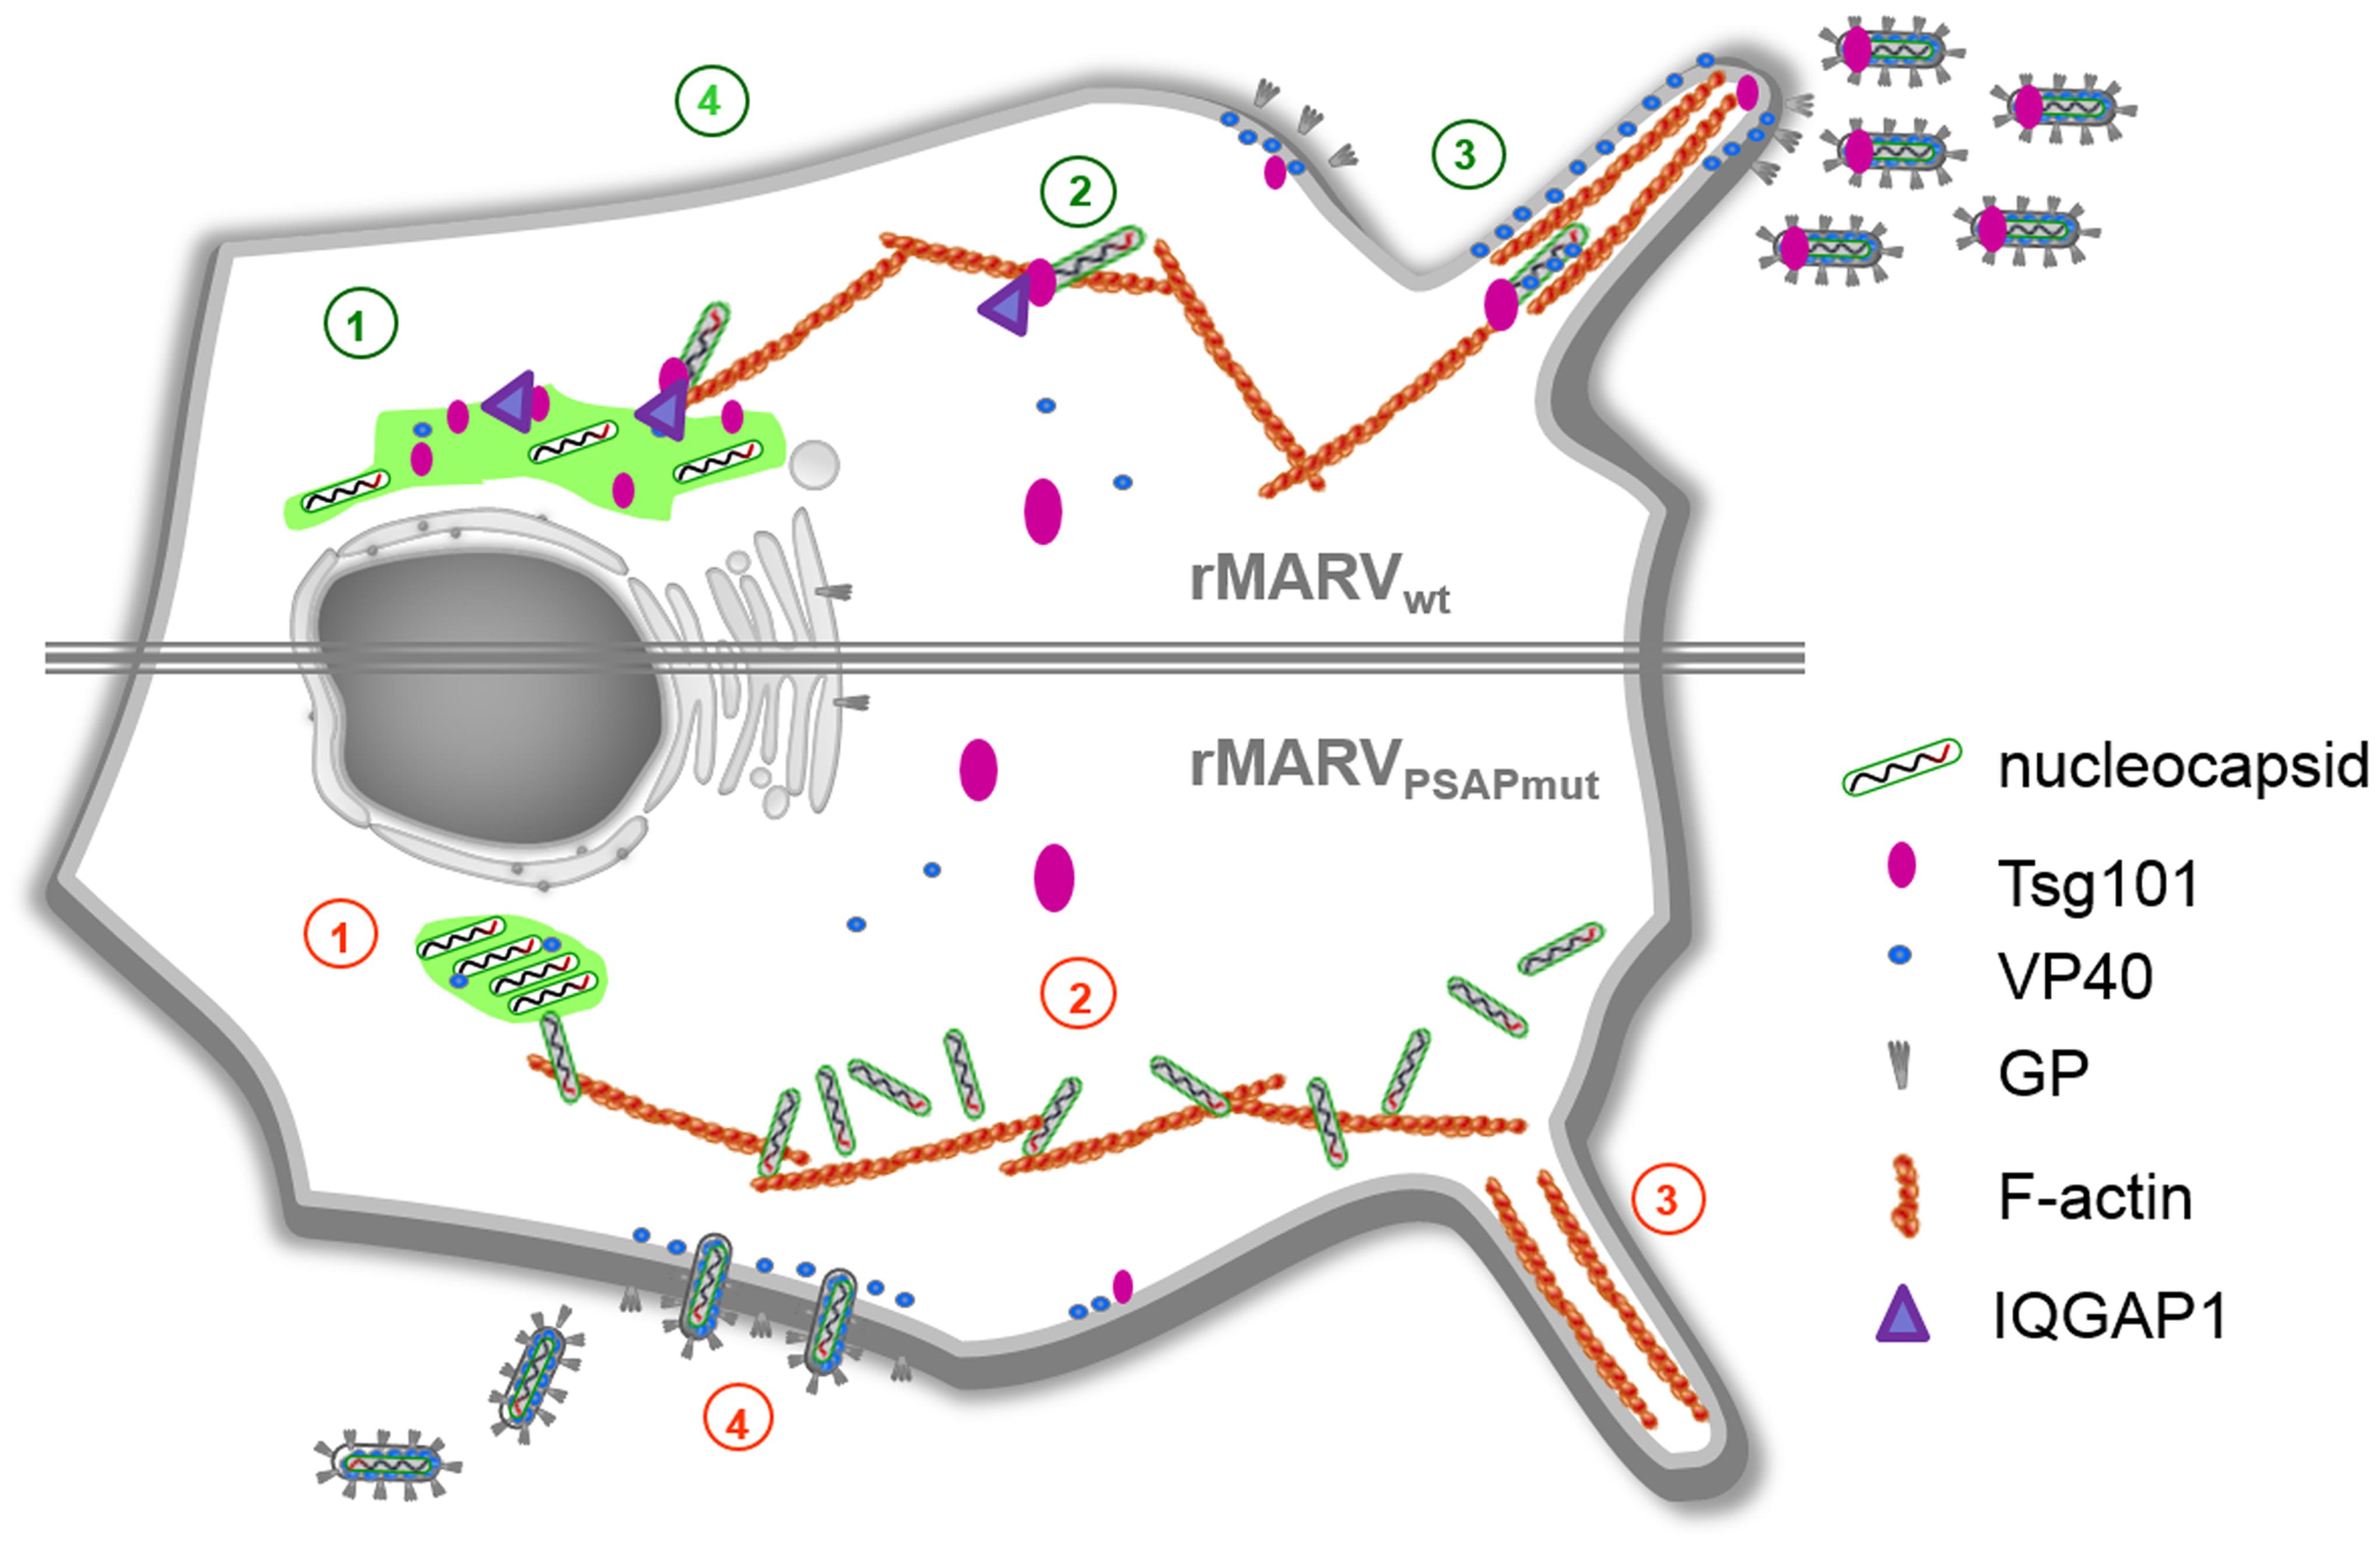 Schematic presentation of the rMARV<sub>PSAPmut</sub> phenotype in comparison to rMARV<sub>wt</sub>.